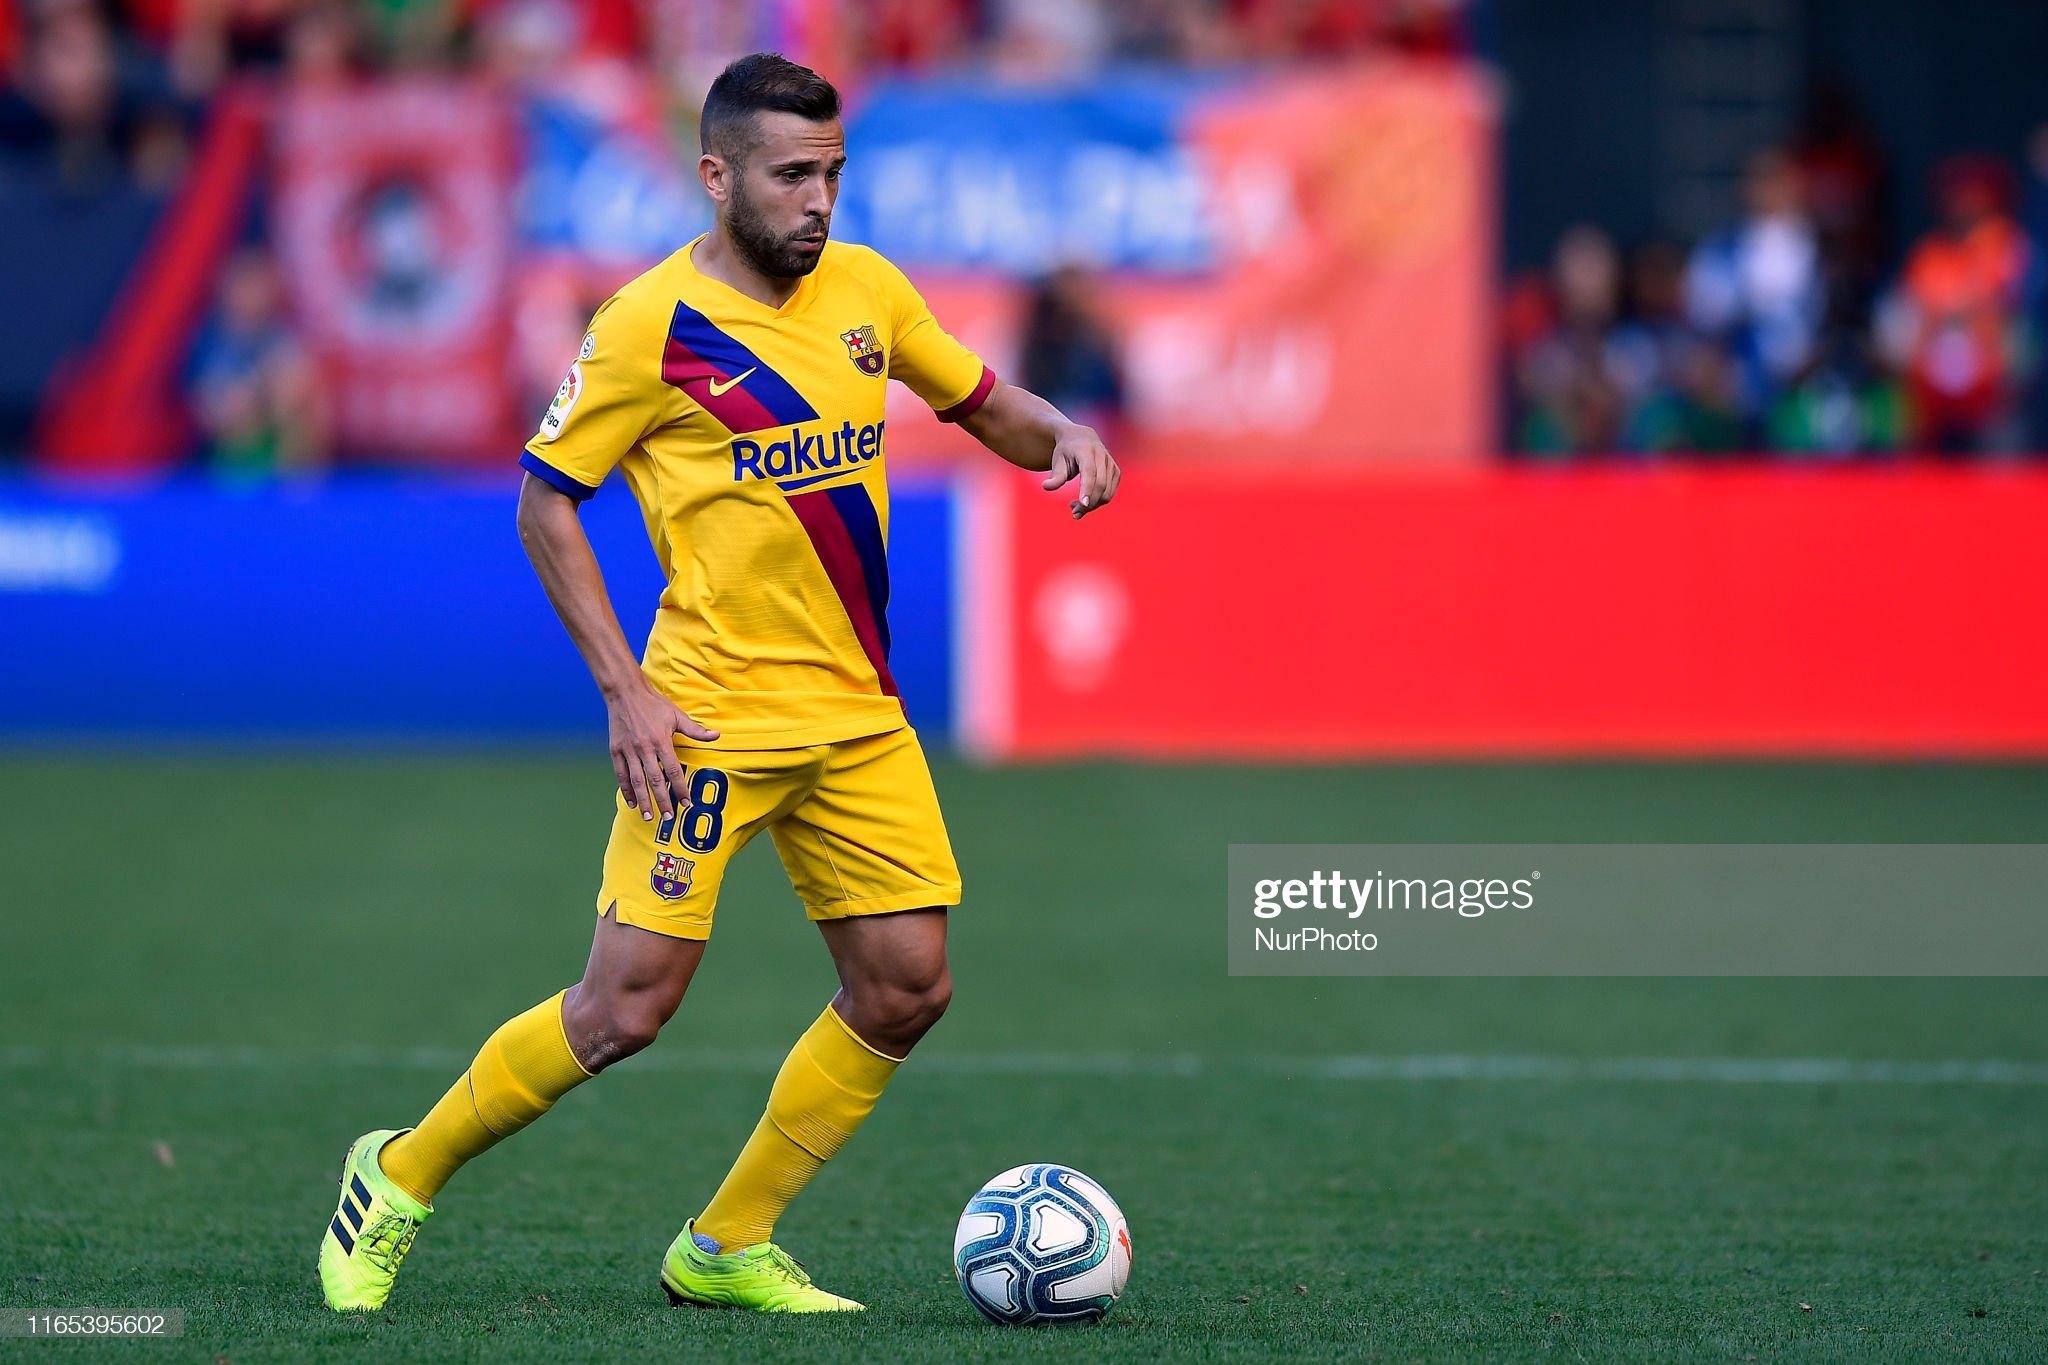 صور مباراة : أوساسونا - برشلونة 2-2 ( 31-08-2019 )  Jordi-alba-of-barcelona-in-action-during-the-liga-match-between-ca-picture-id1165395602?s=2048x2048